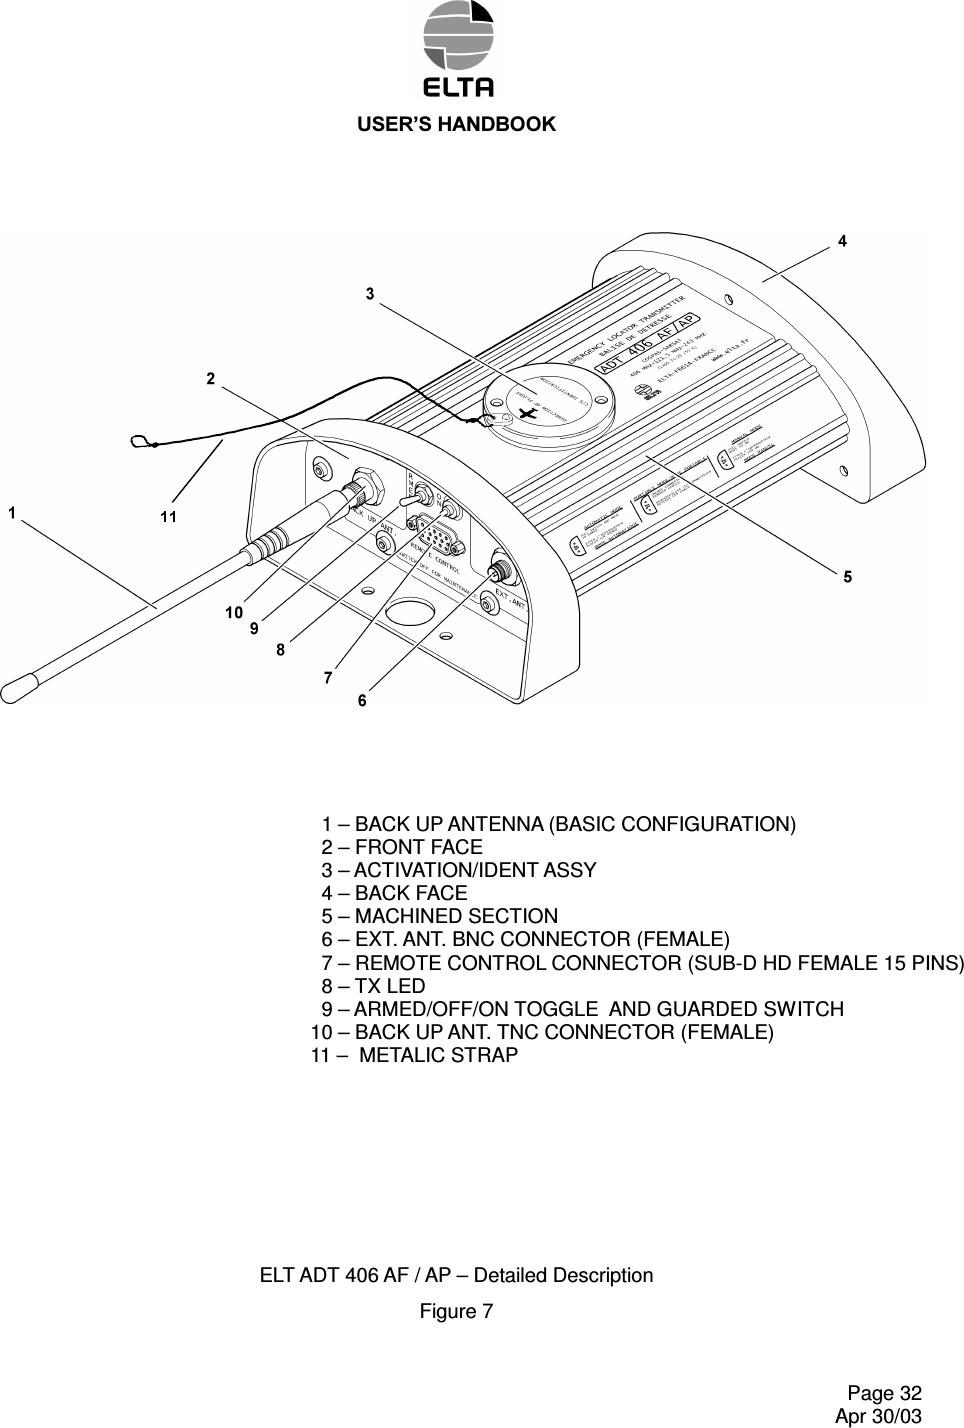 ELTA ADT406 ELT 406 MHz (Emergency Locator Transmitter